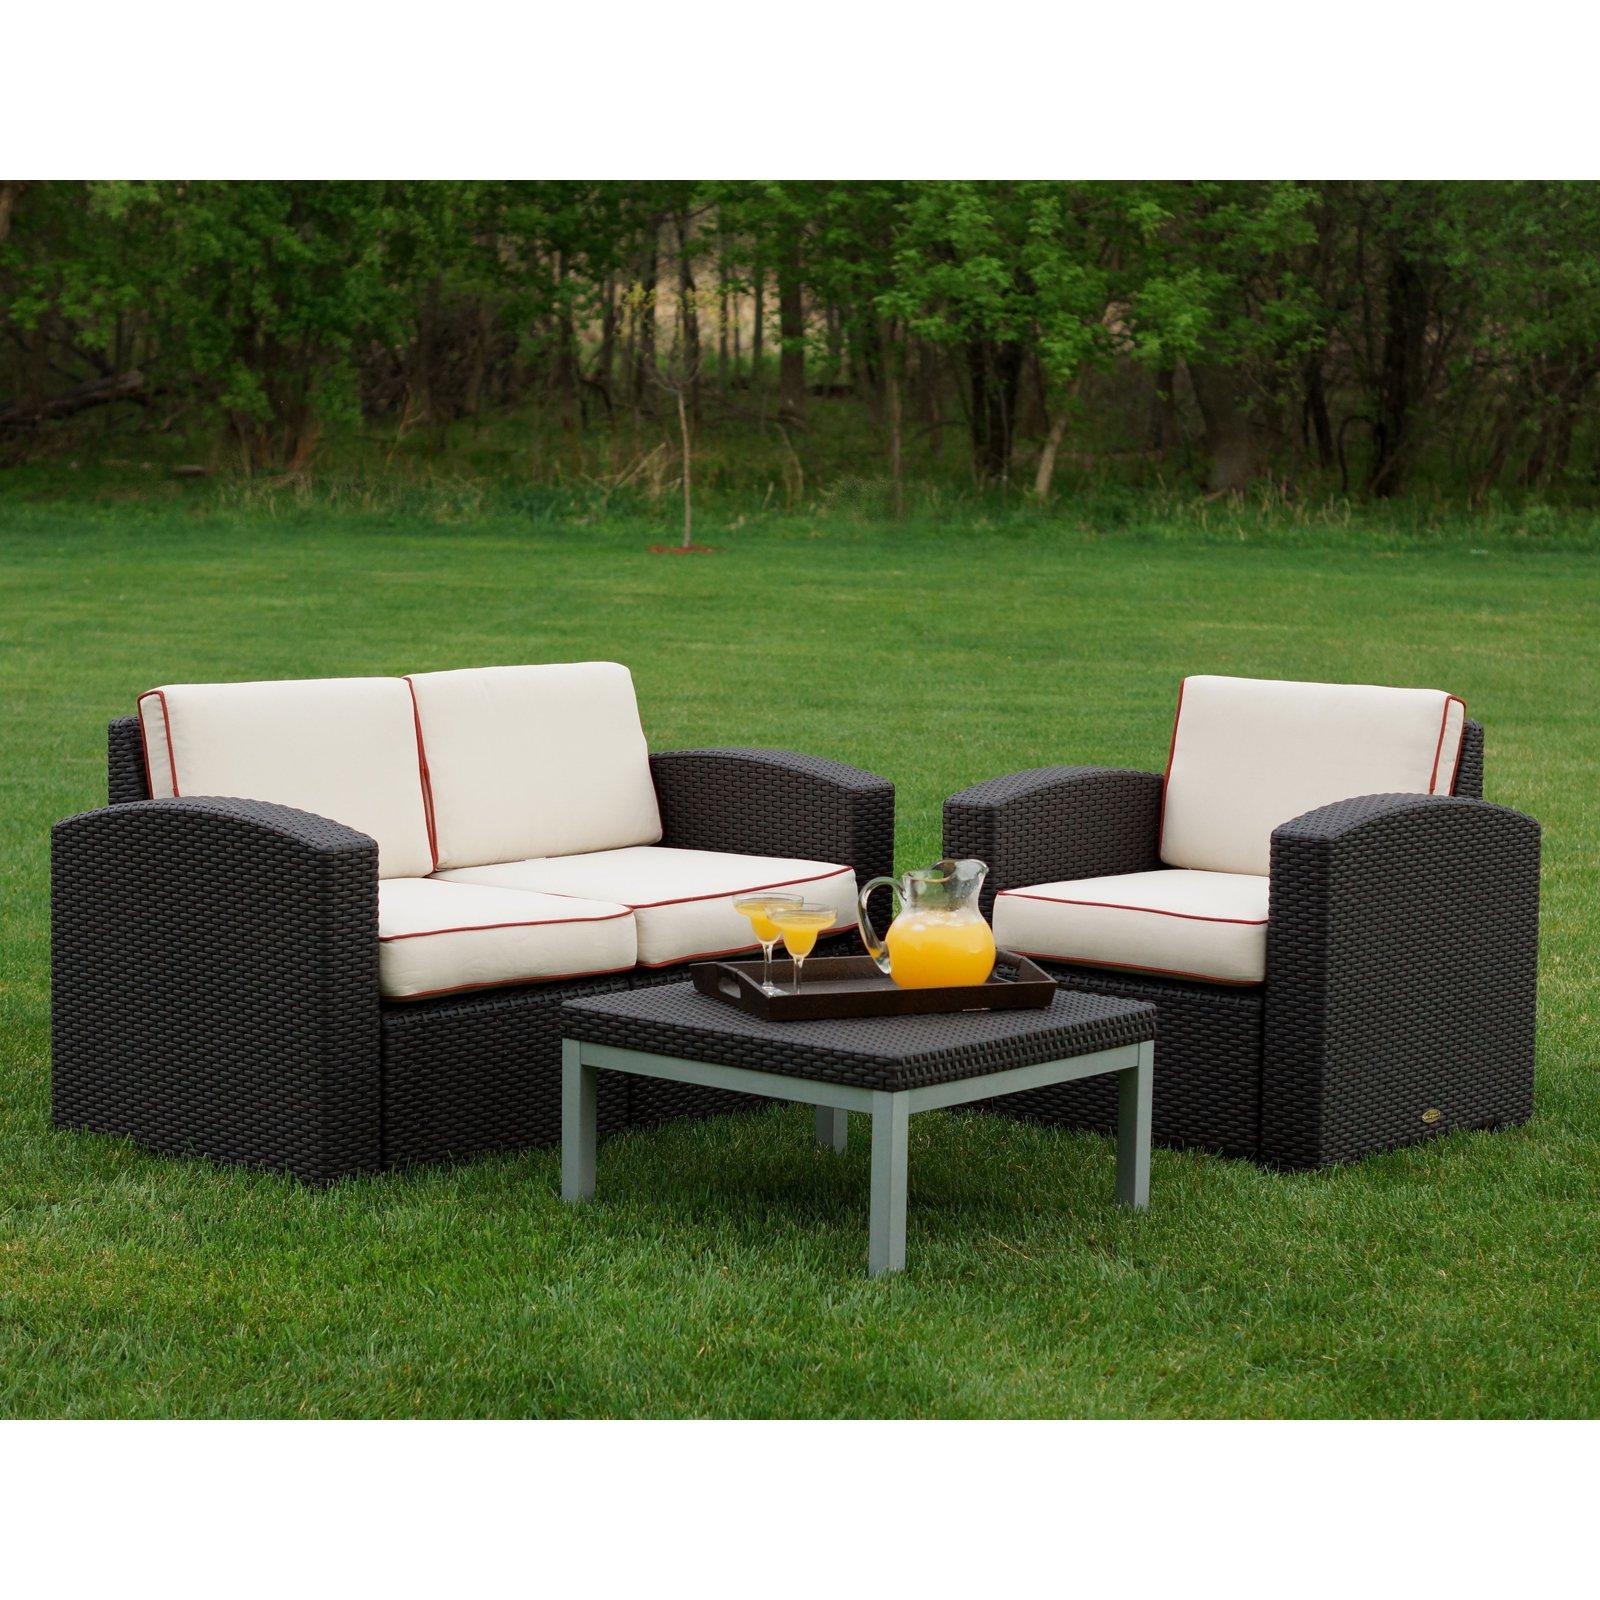 Strata Furniture Cielo 3 Piece Chair and Loveseat Conversation Set